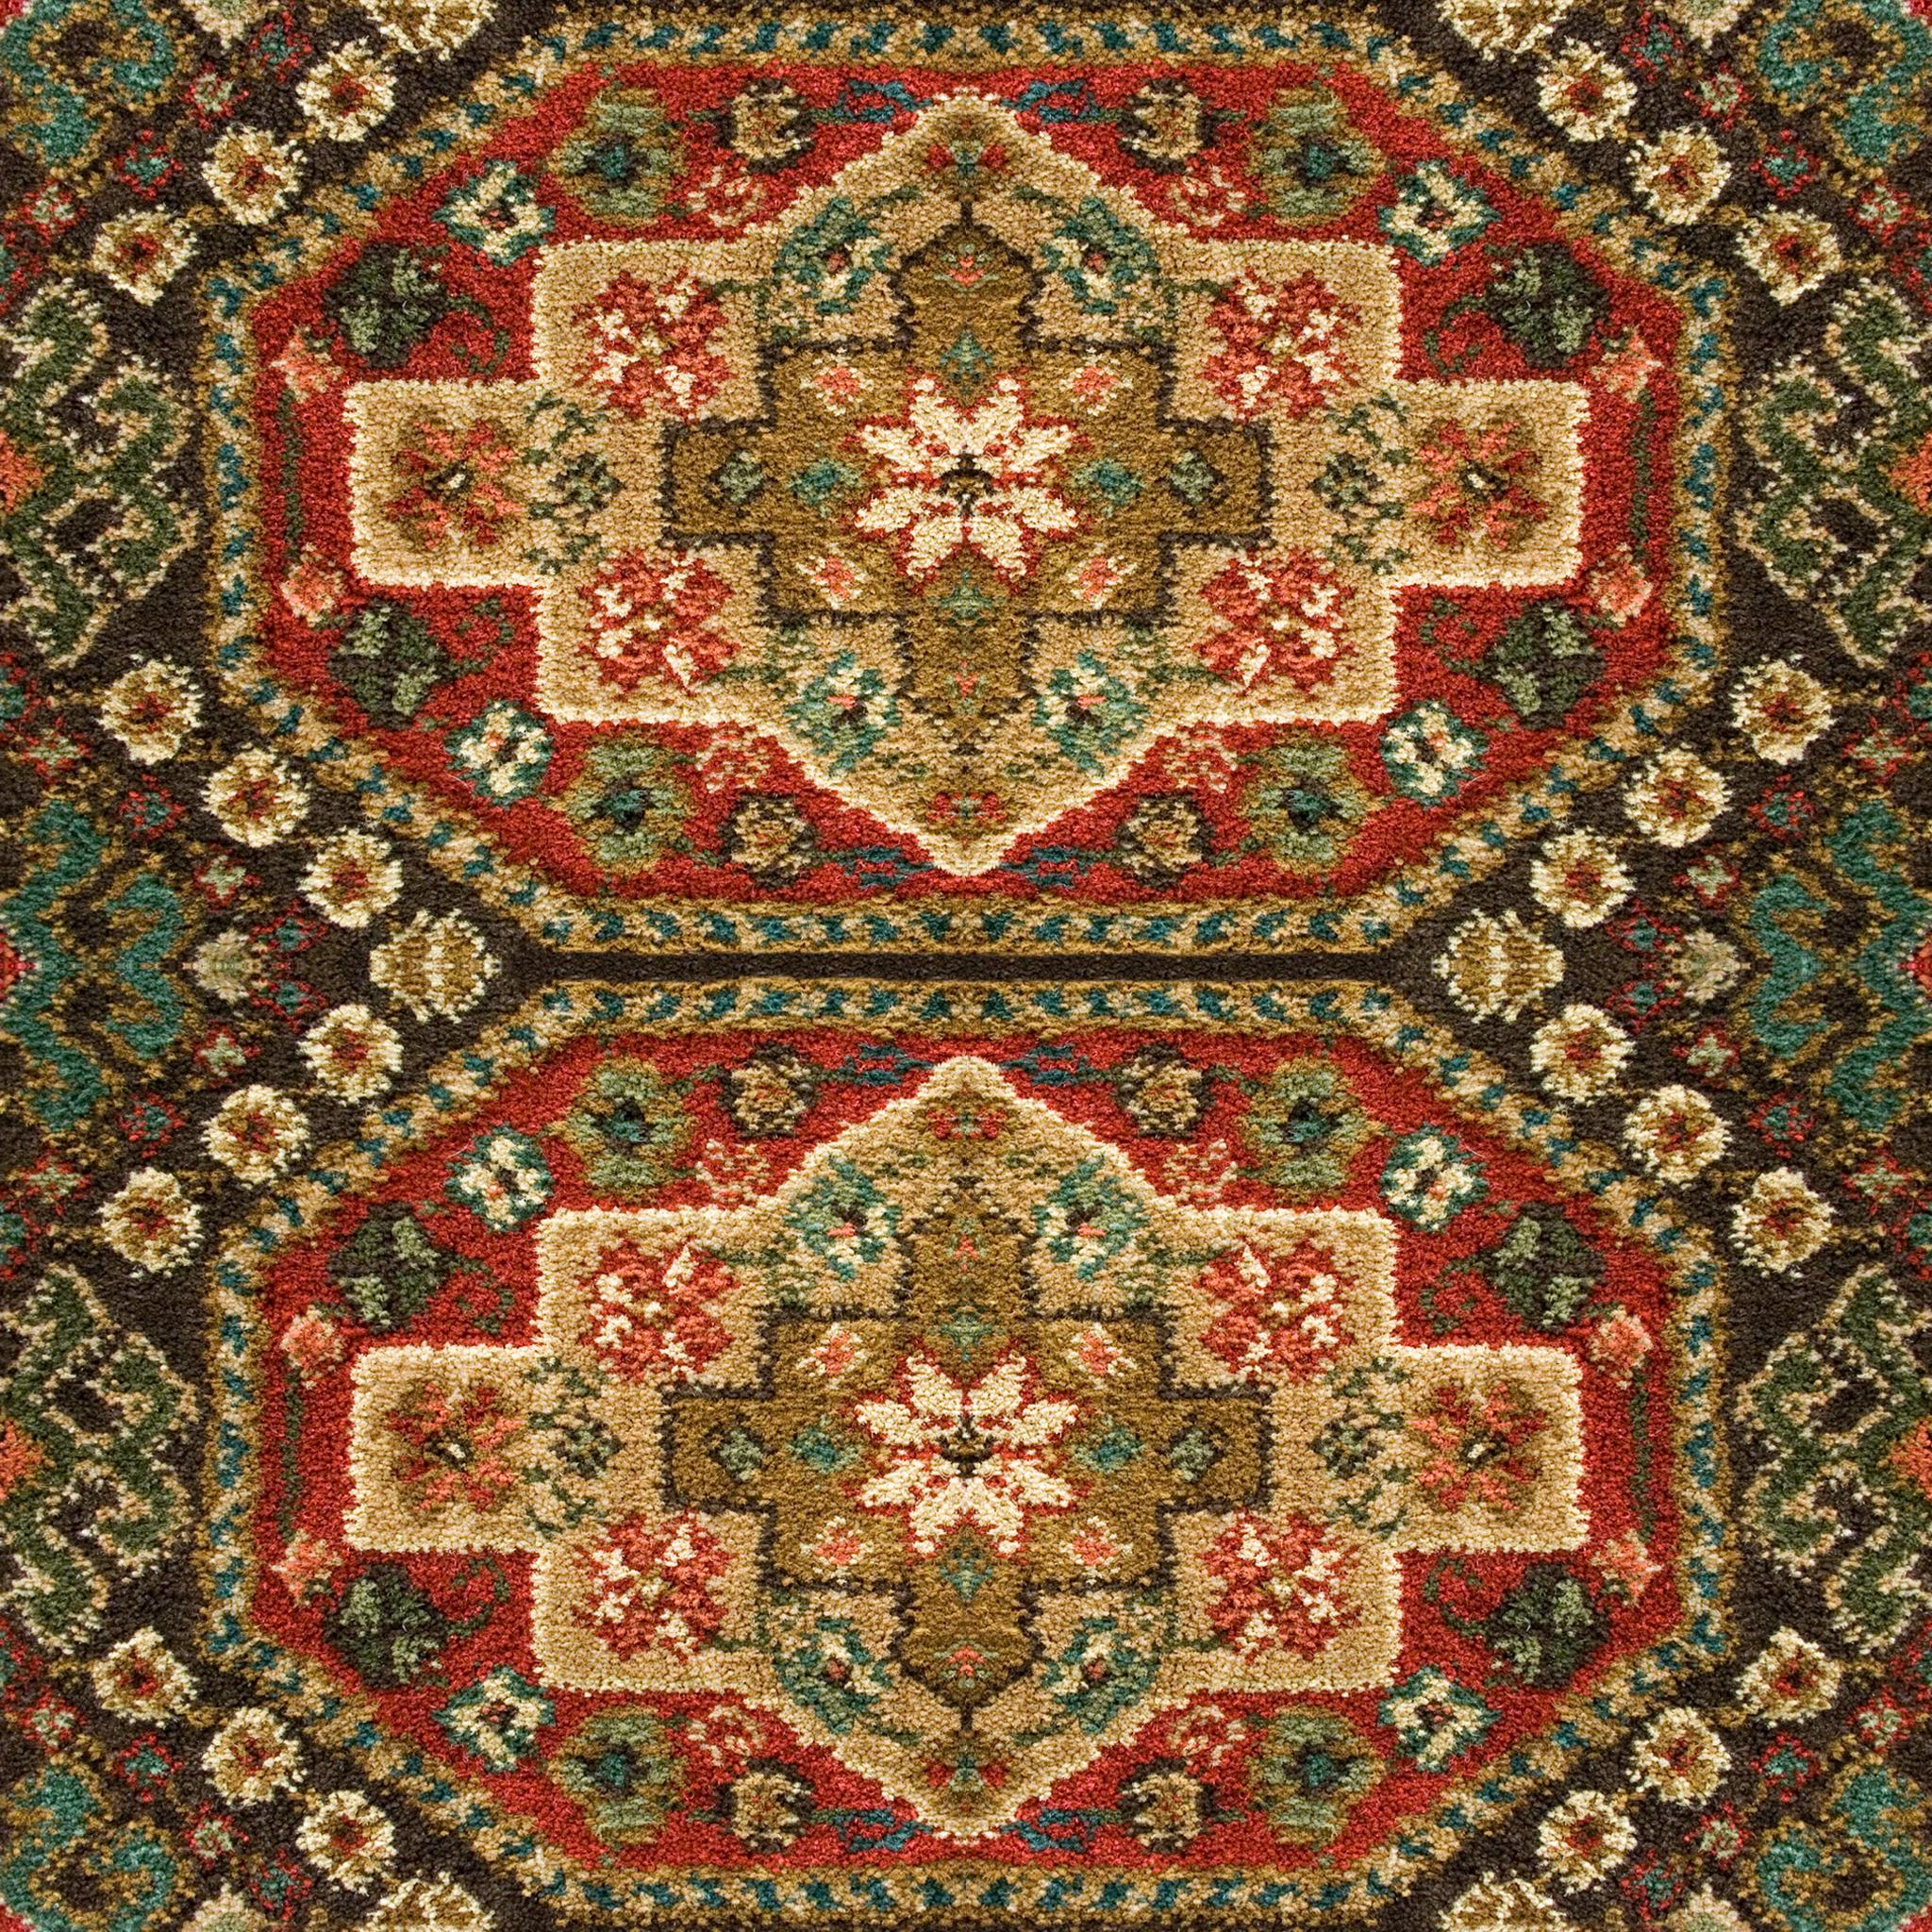 Geometric Reflection Carpet.jpg